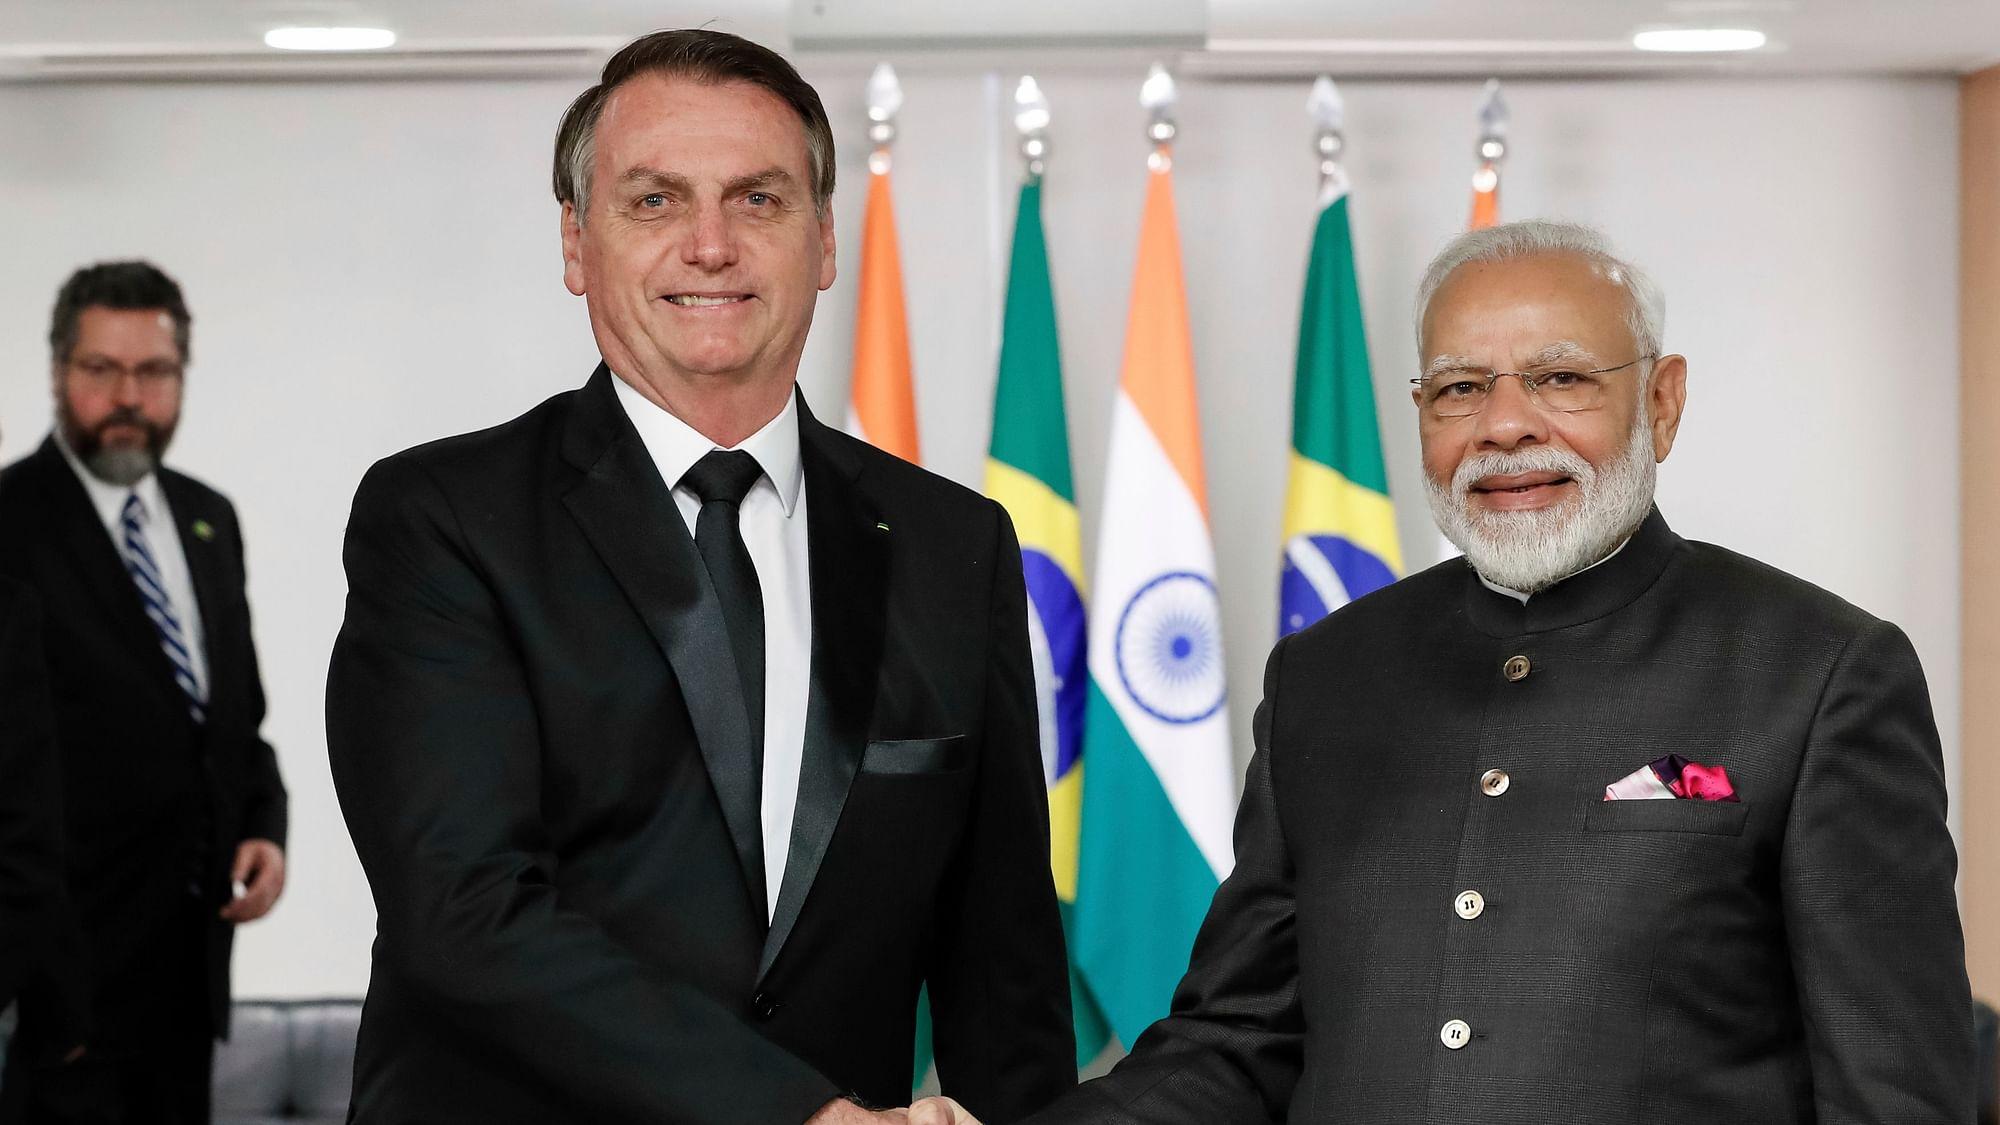 Kerala MP to Boycott R-Day Revelry Over Invite to Brazilian Prez